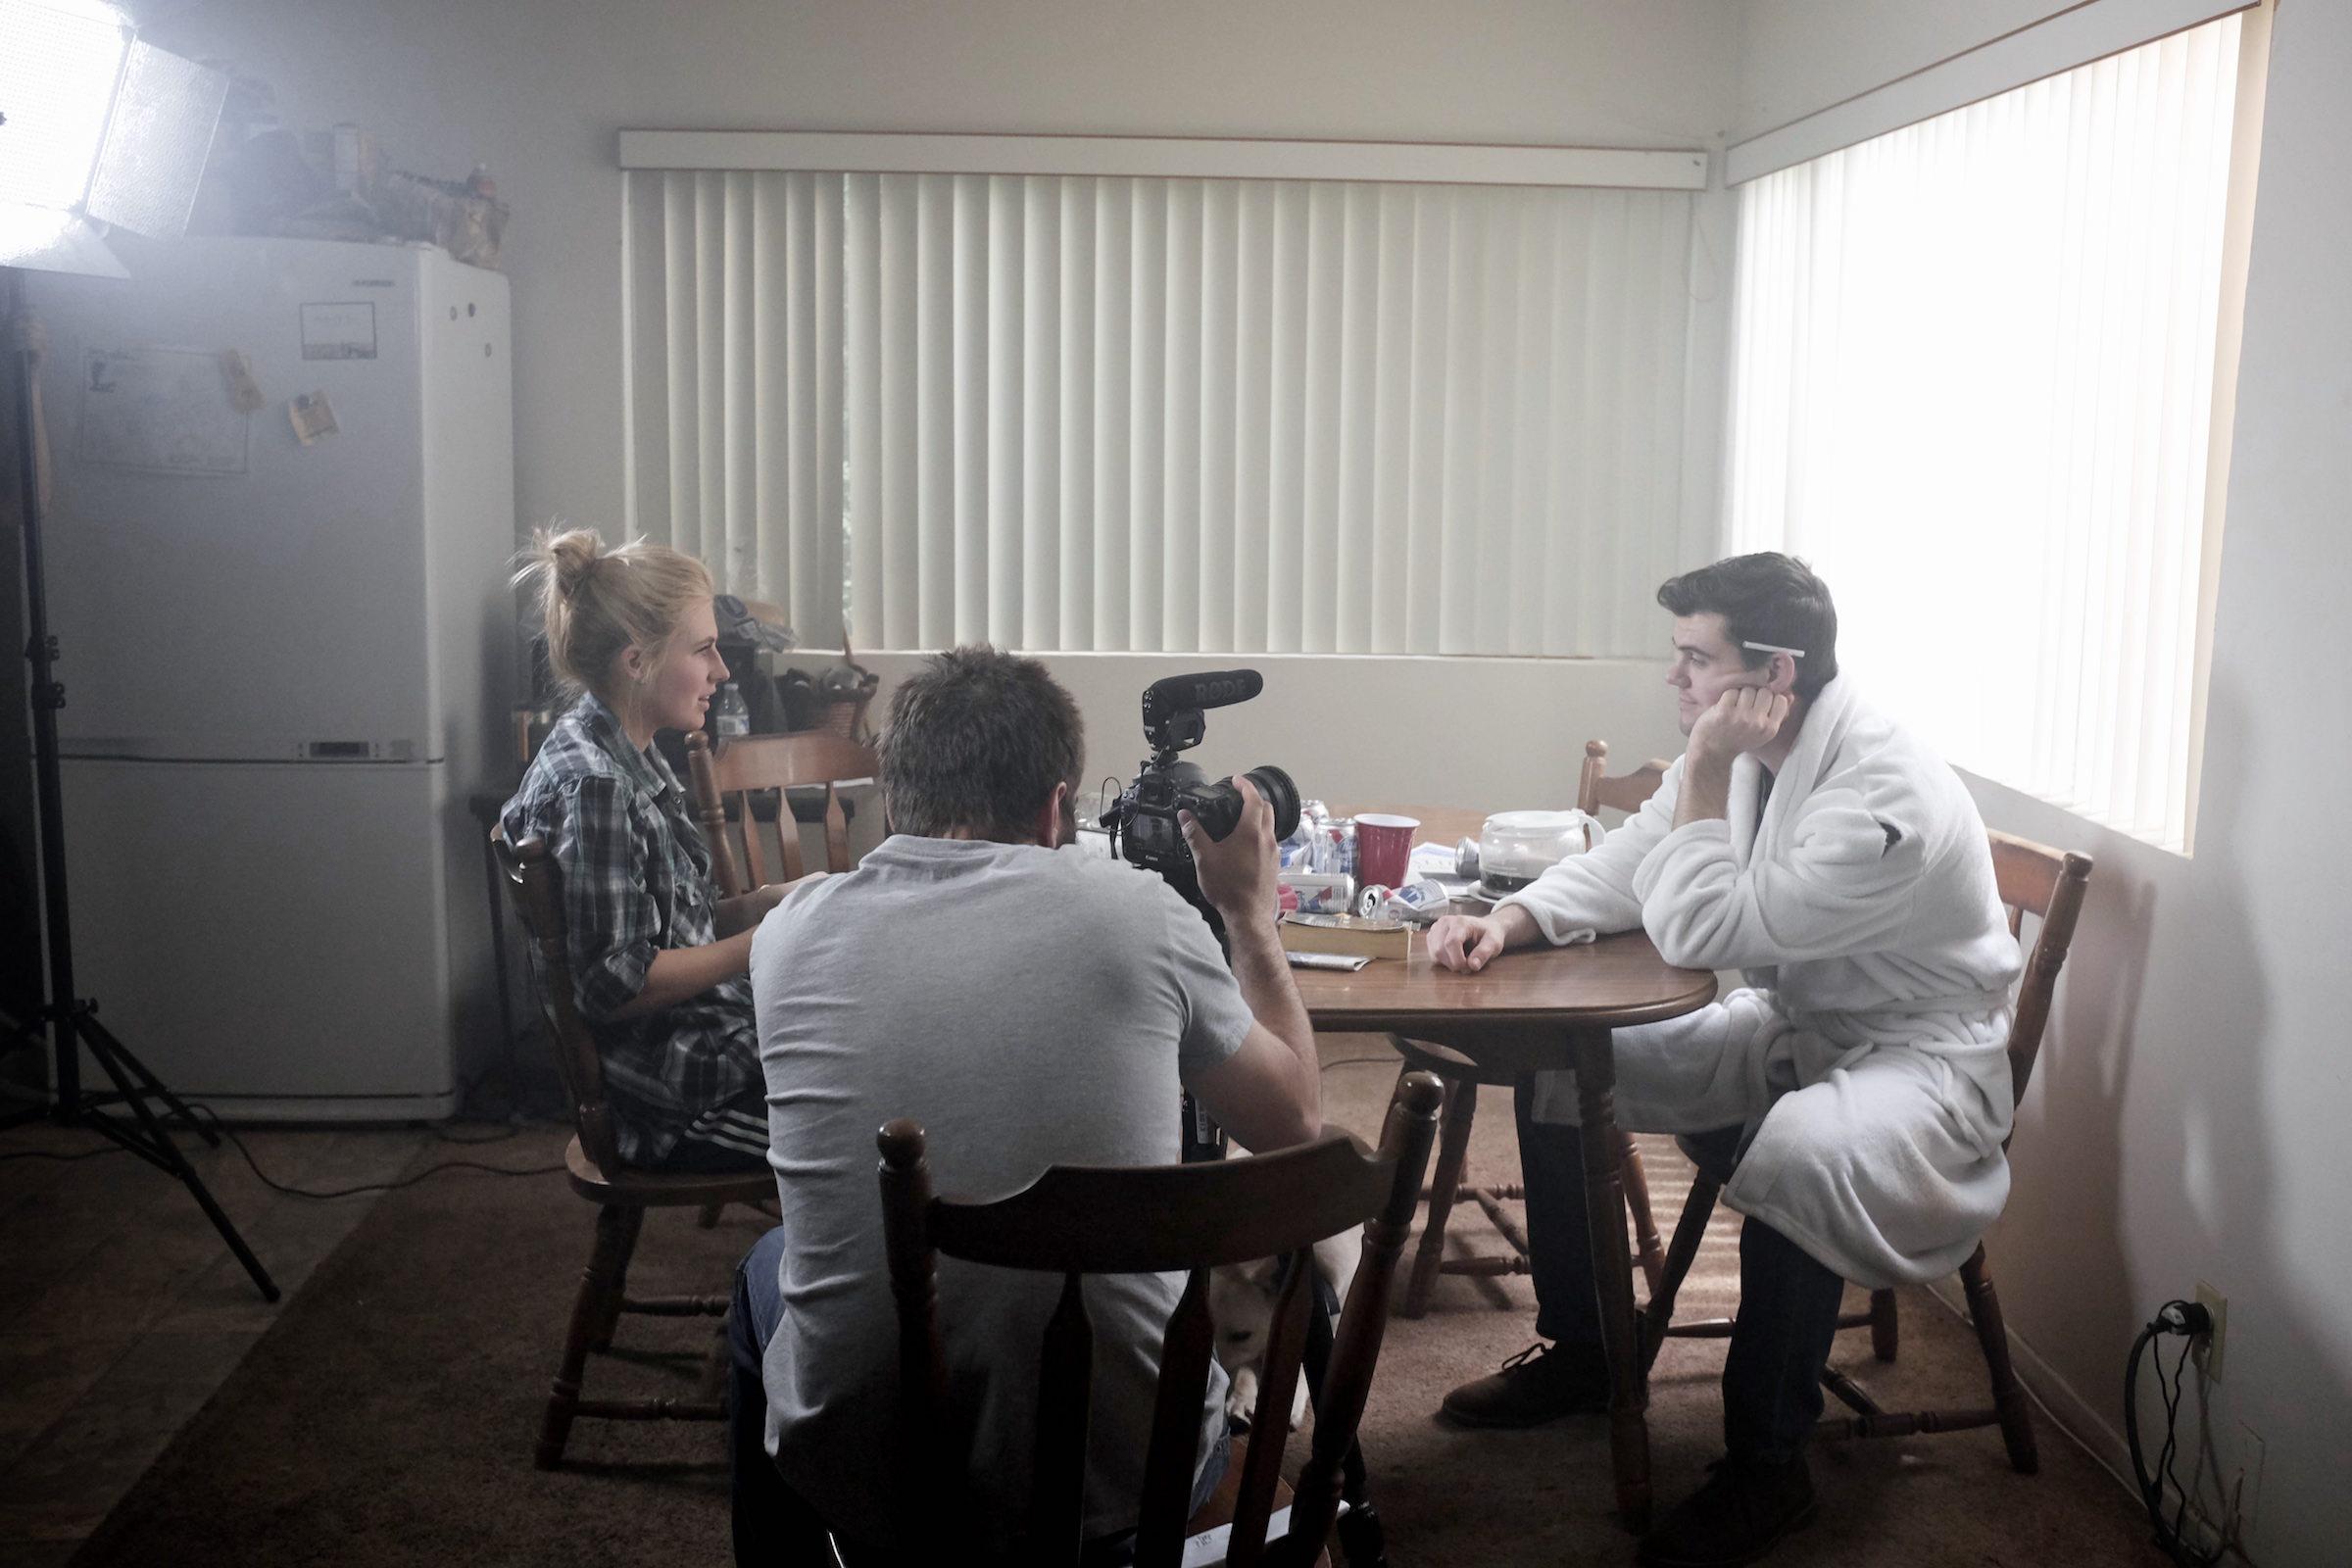 Cameron Kelly, Zach Frankart, and Trent Rowland on set